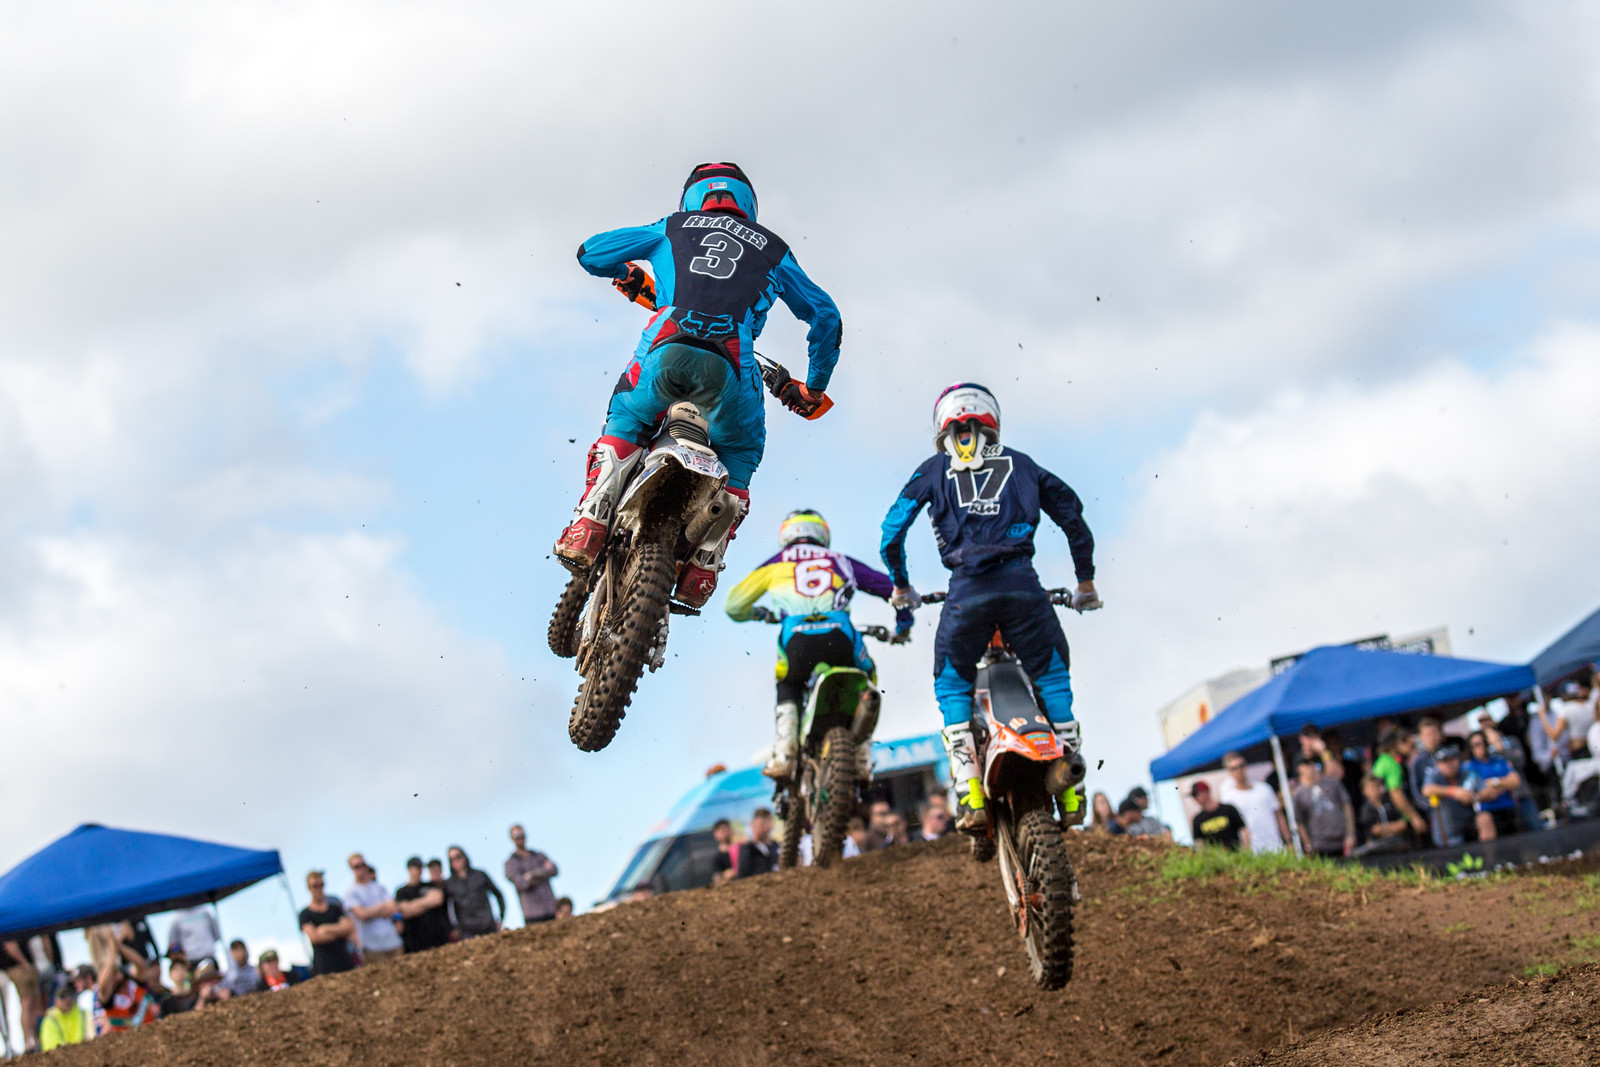 Jayden Reykers, Caleb Ward, and Jake Moss - Australian Motul Motocross Nationals Round 2, Appin - Motocross Pictures - Vital MX